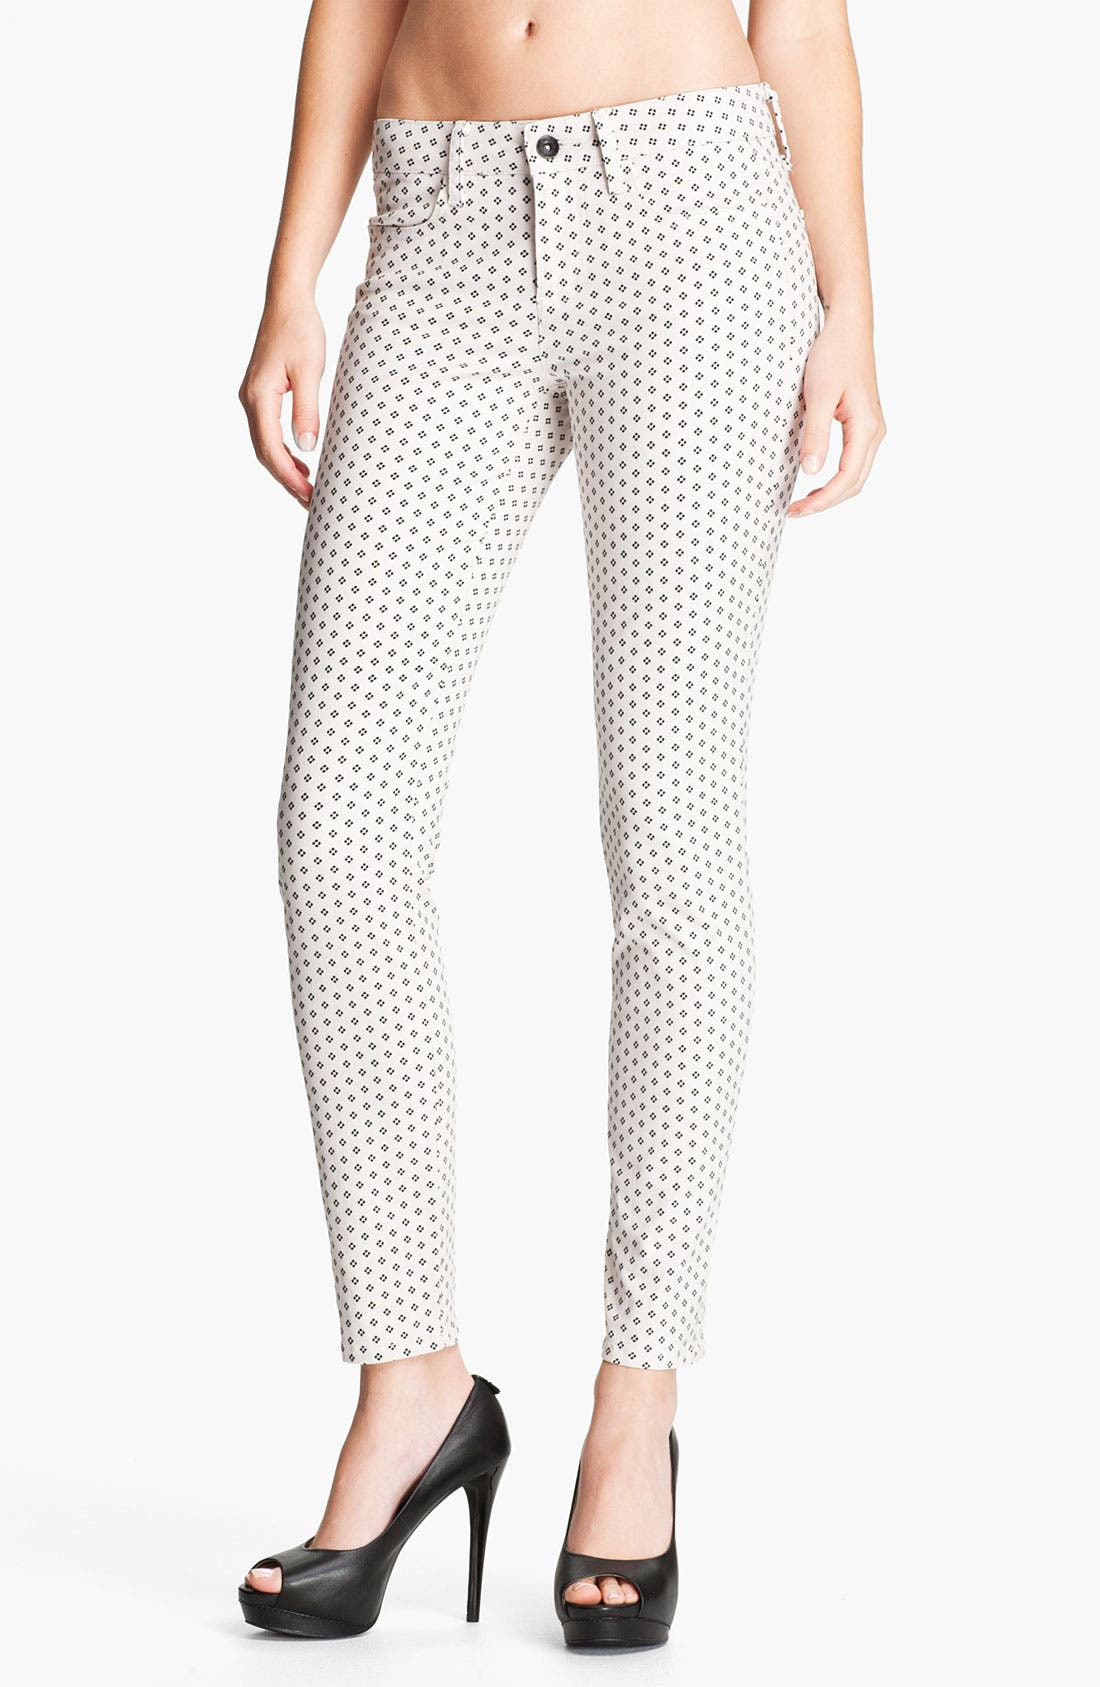 Alternate Image 1 Selected - Splendid Print Skinny Jeans (Swan)